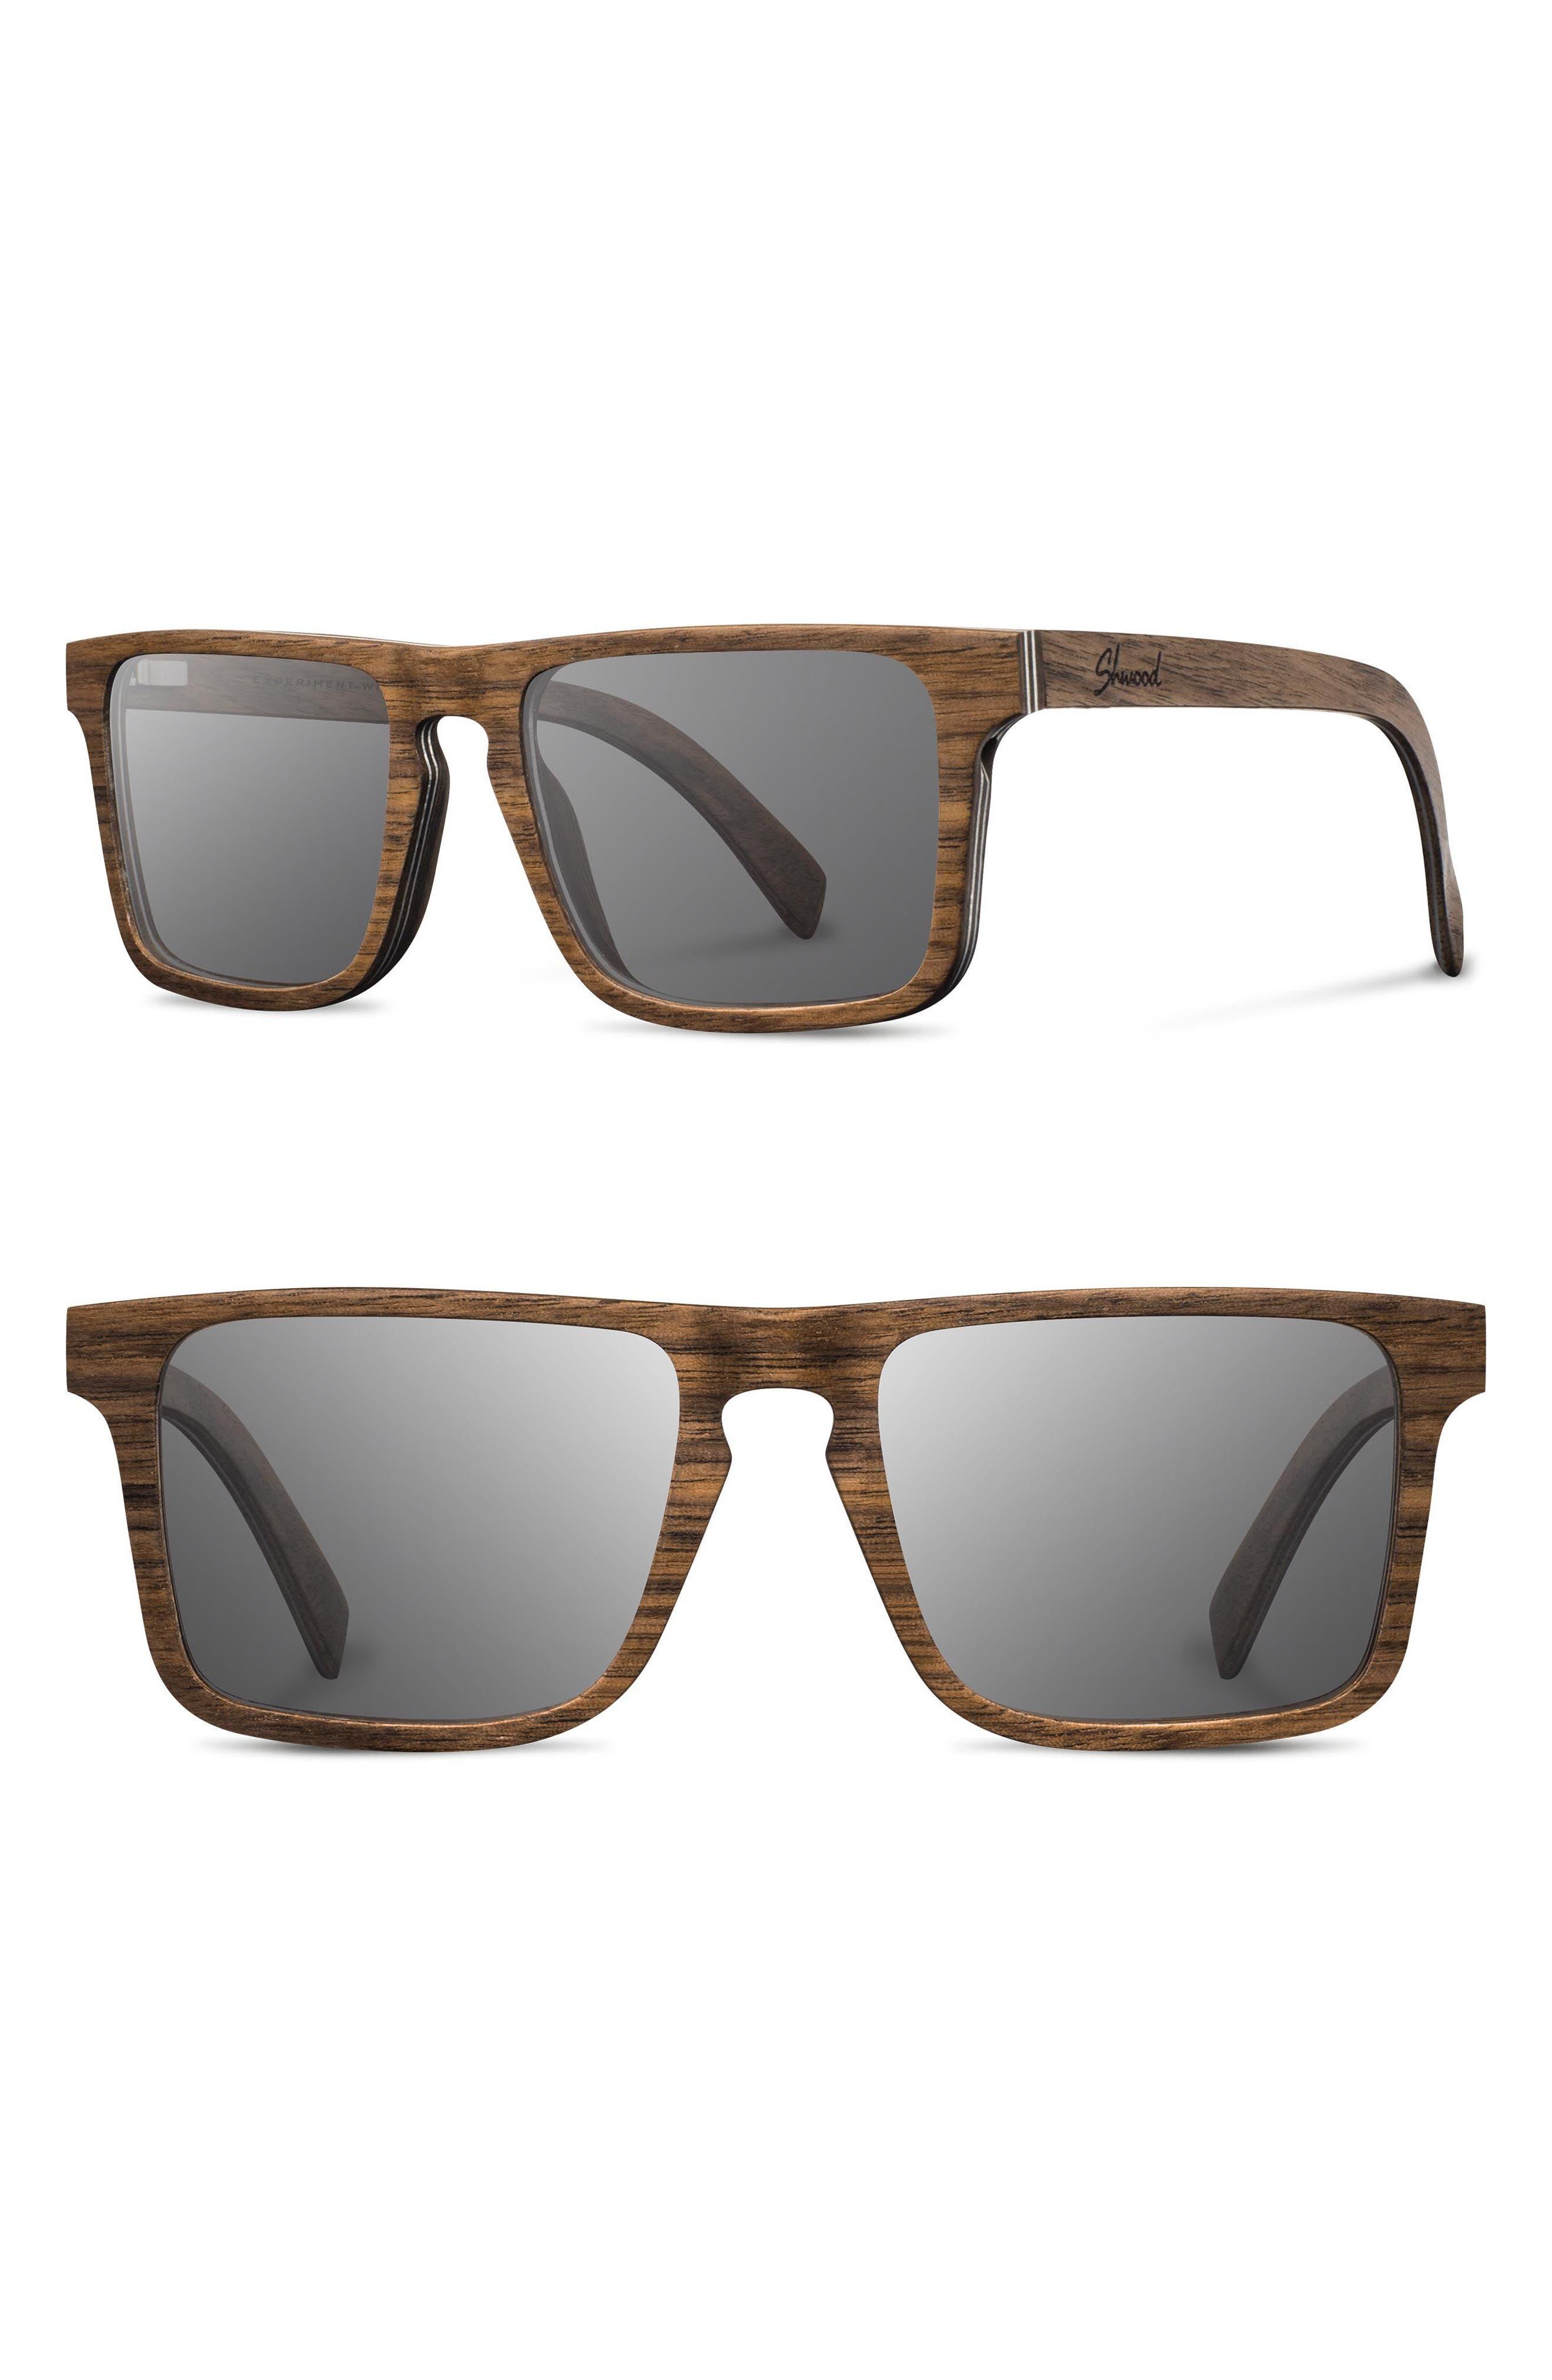 Govy 2 52mm Polarized Wood Sunglasses,                             Main thumbnail 1, color,